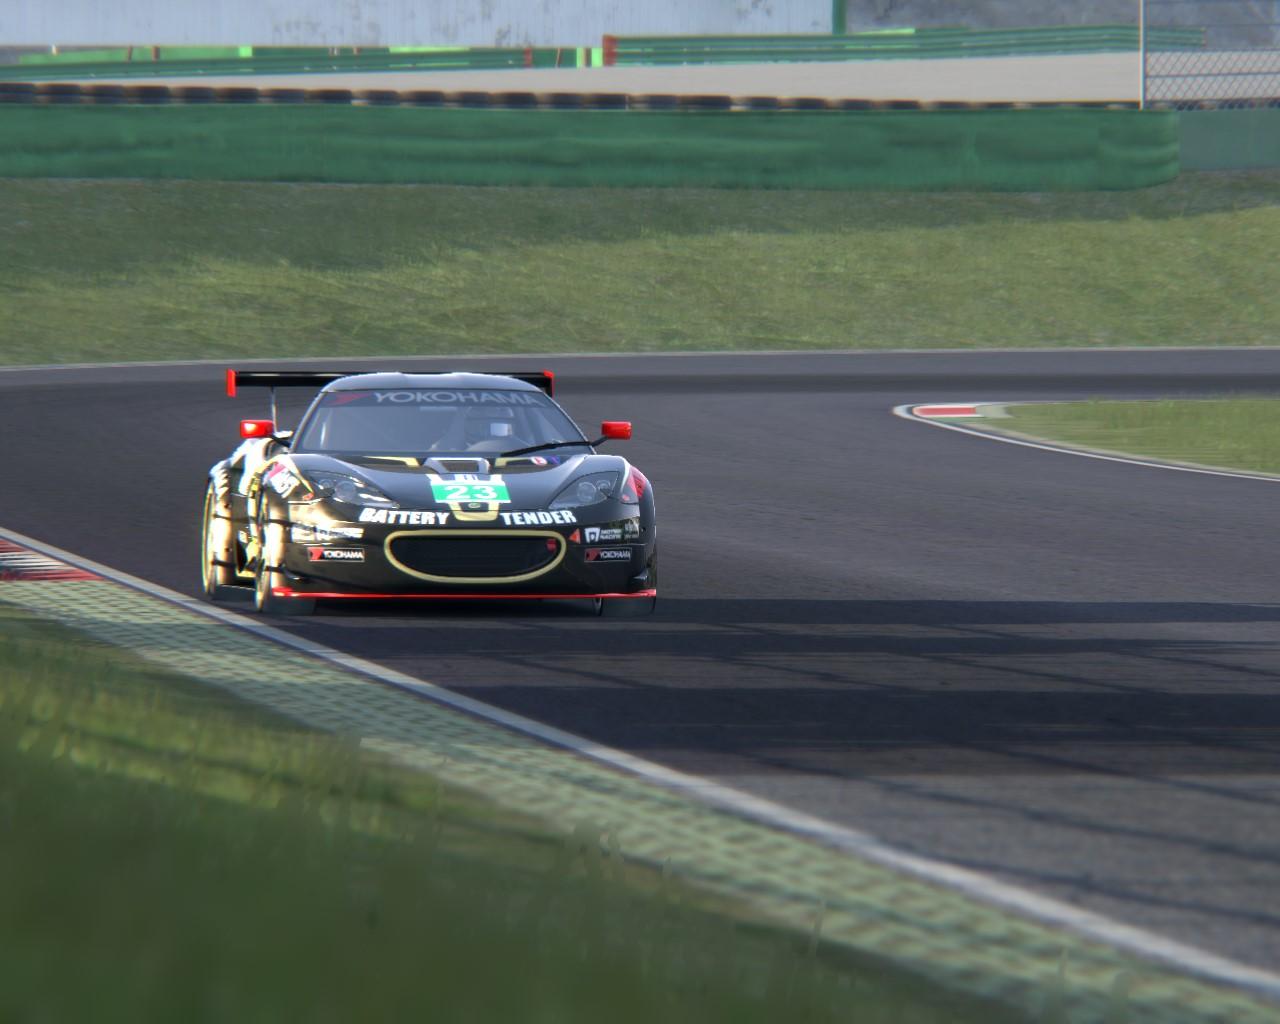 Vallelunga Lotus Evora GTC Track Day 2